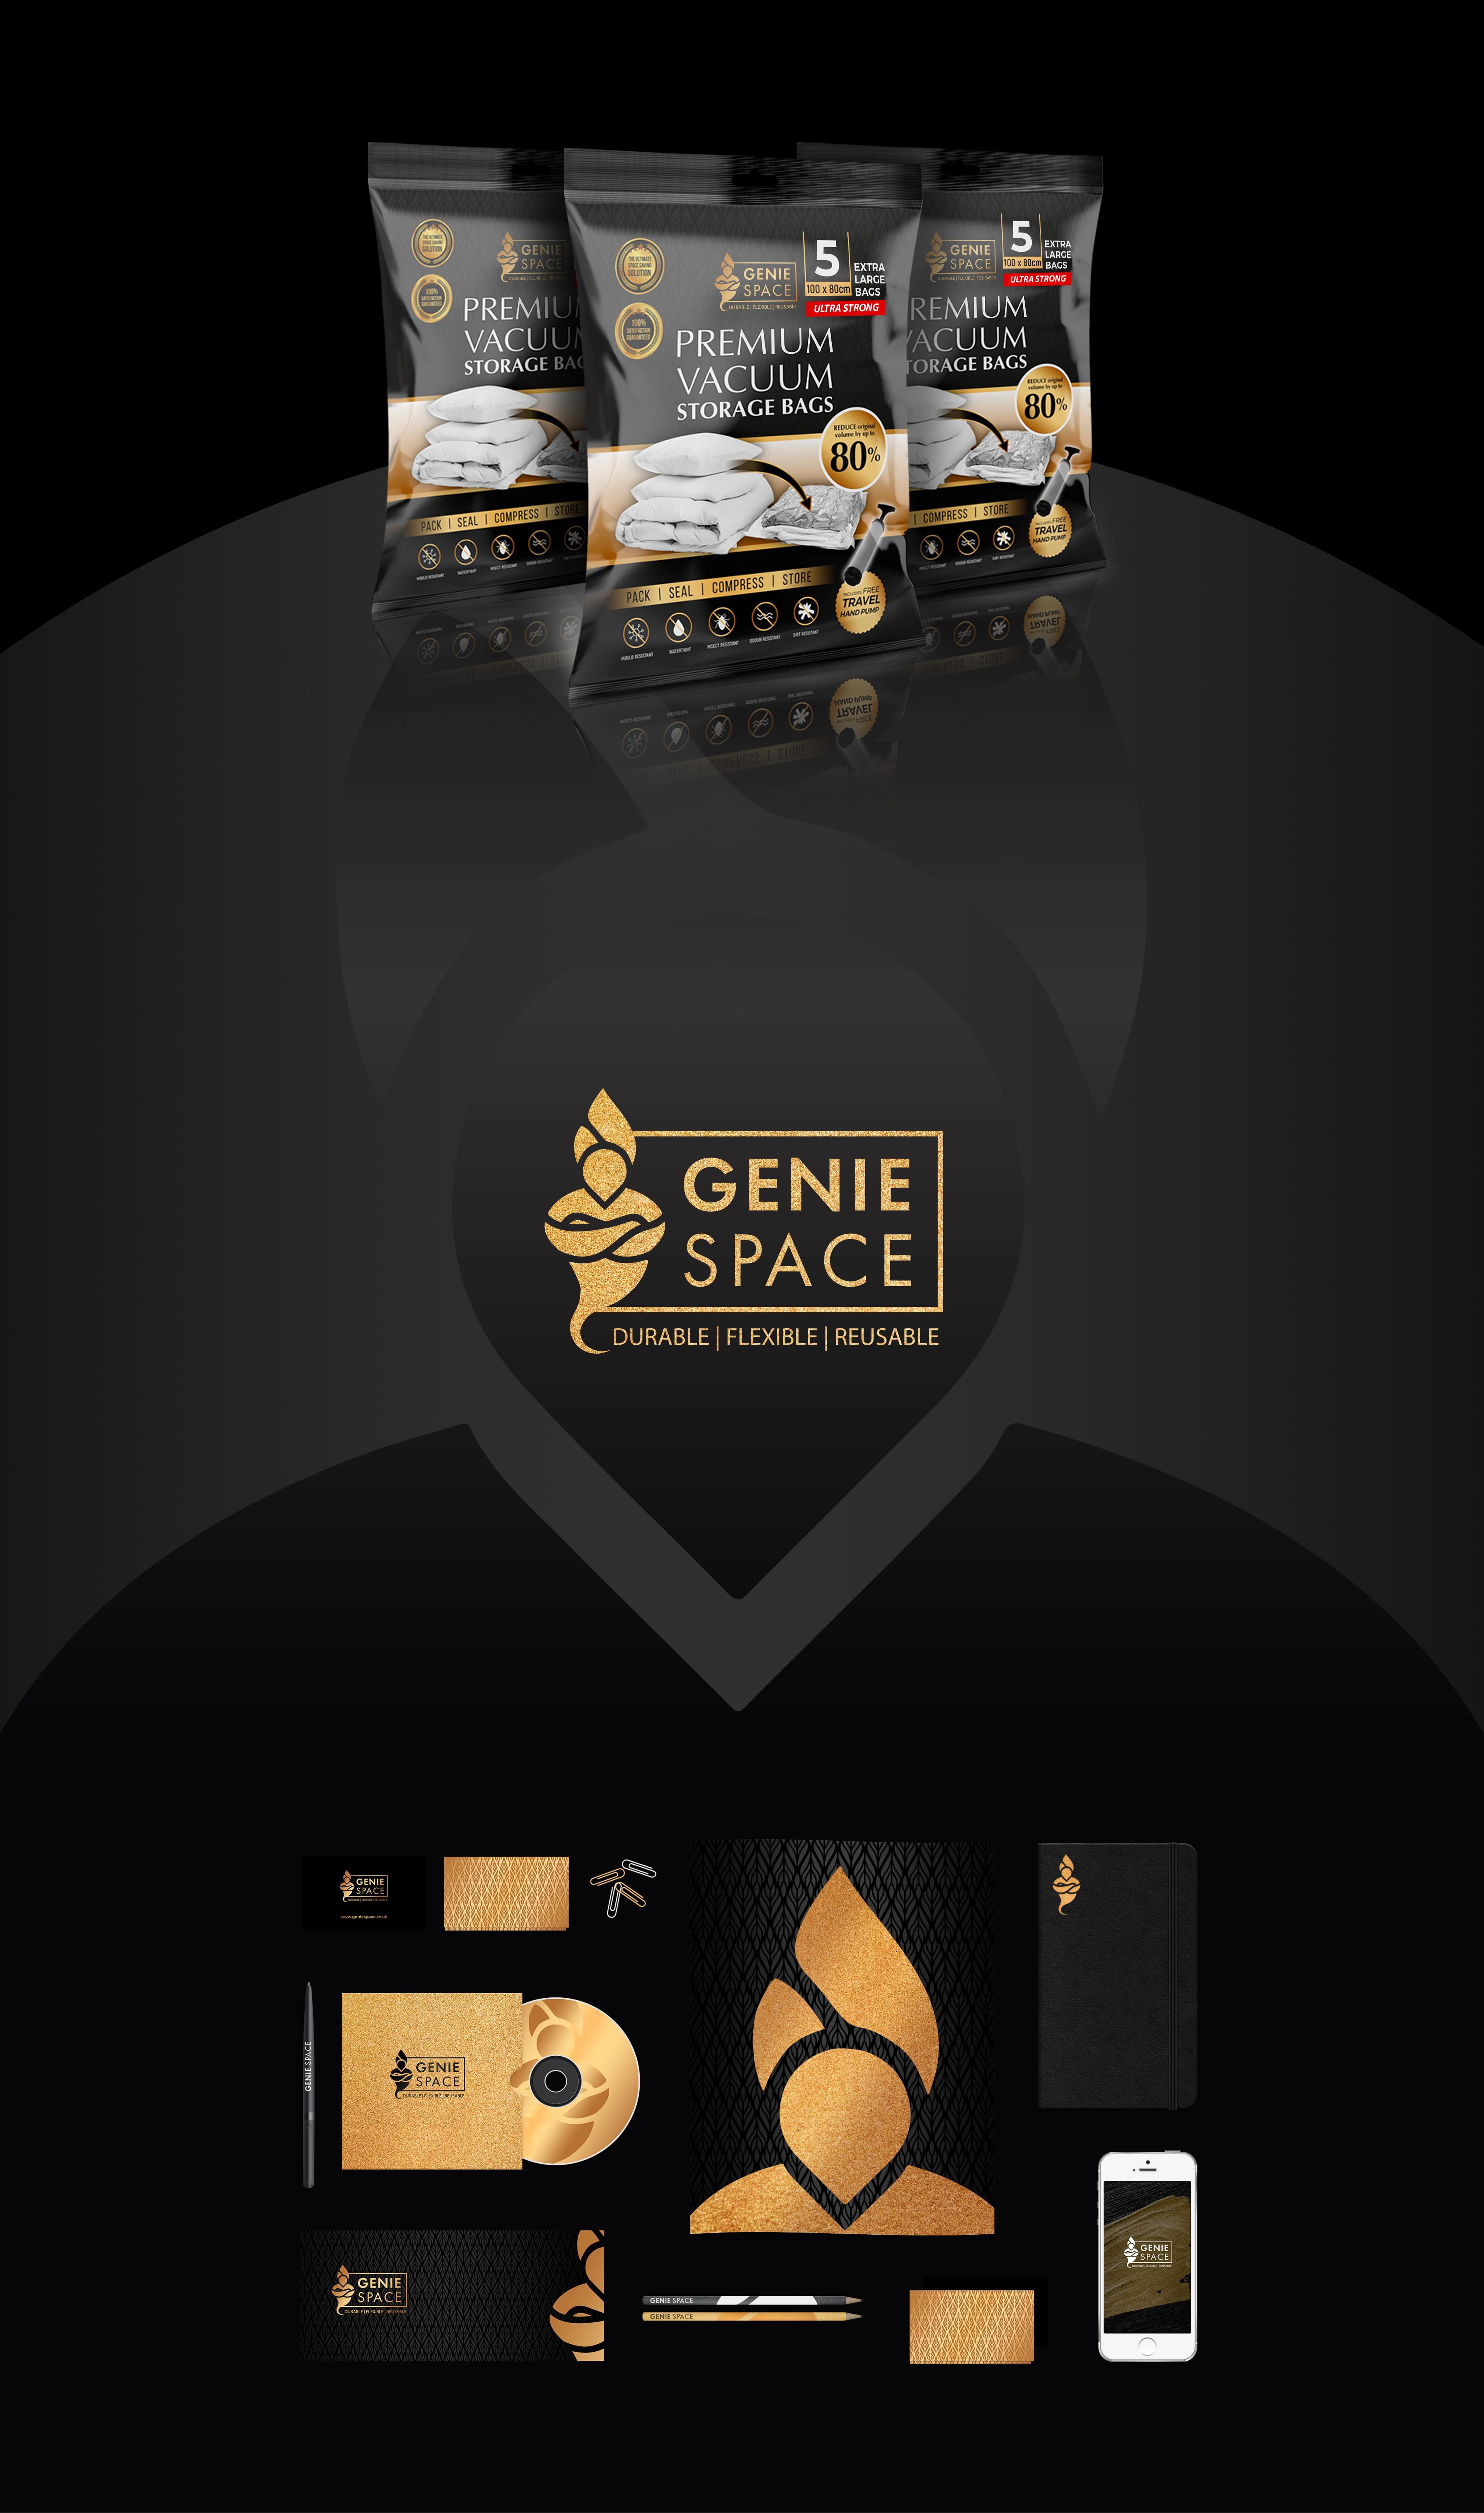 Genie Space | Get Your Creative Brand 2021 | Branding Agency Branding